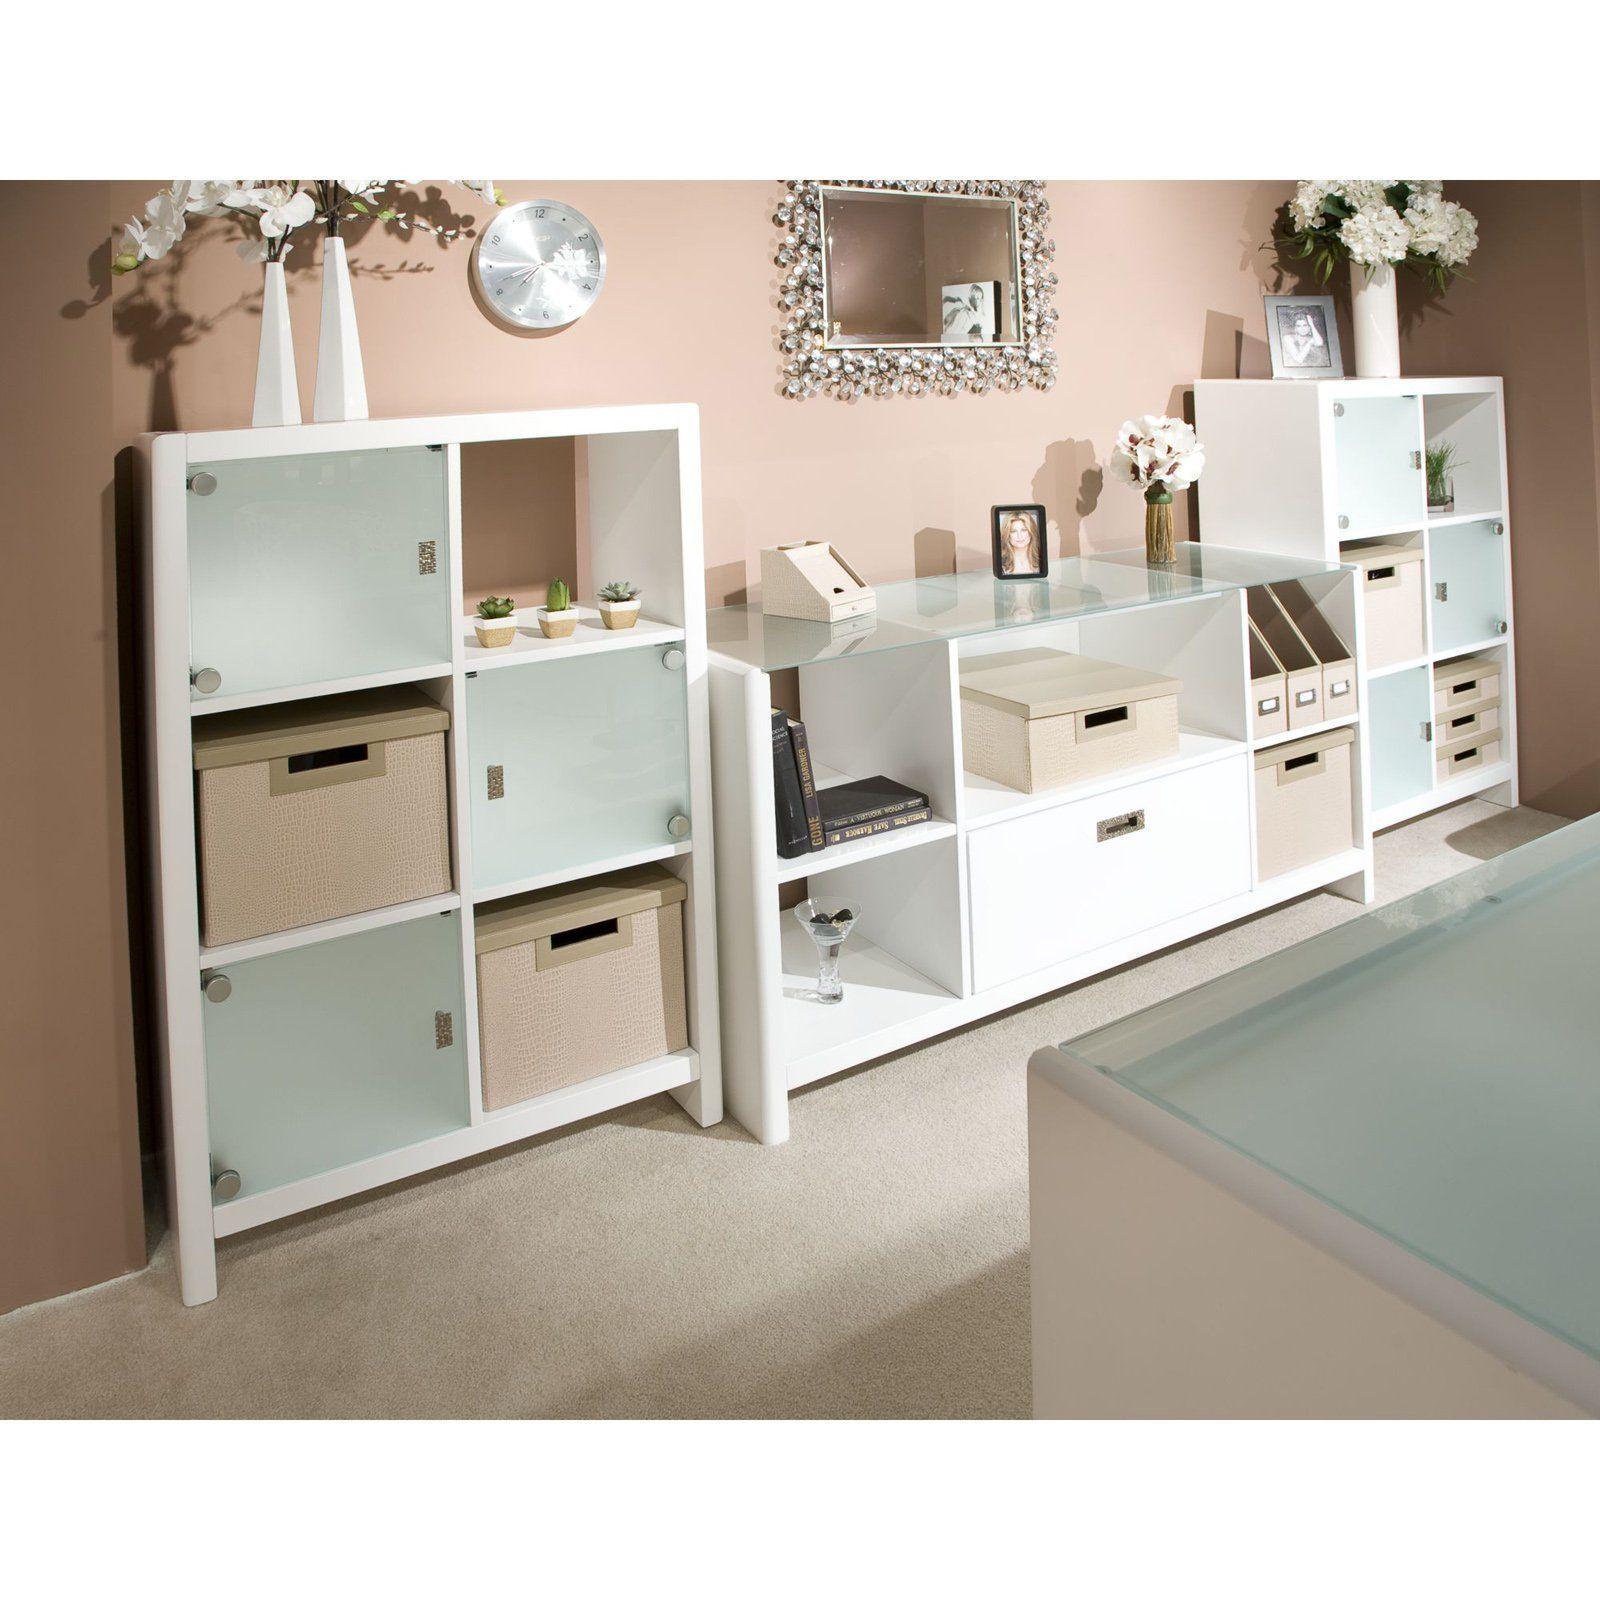 Kathy ireland office by bush furniture new york skyline 6 cube bookcase with optional credenza from hayneedle com bedroomfurniturebybushfurniture